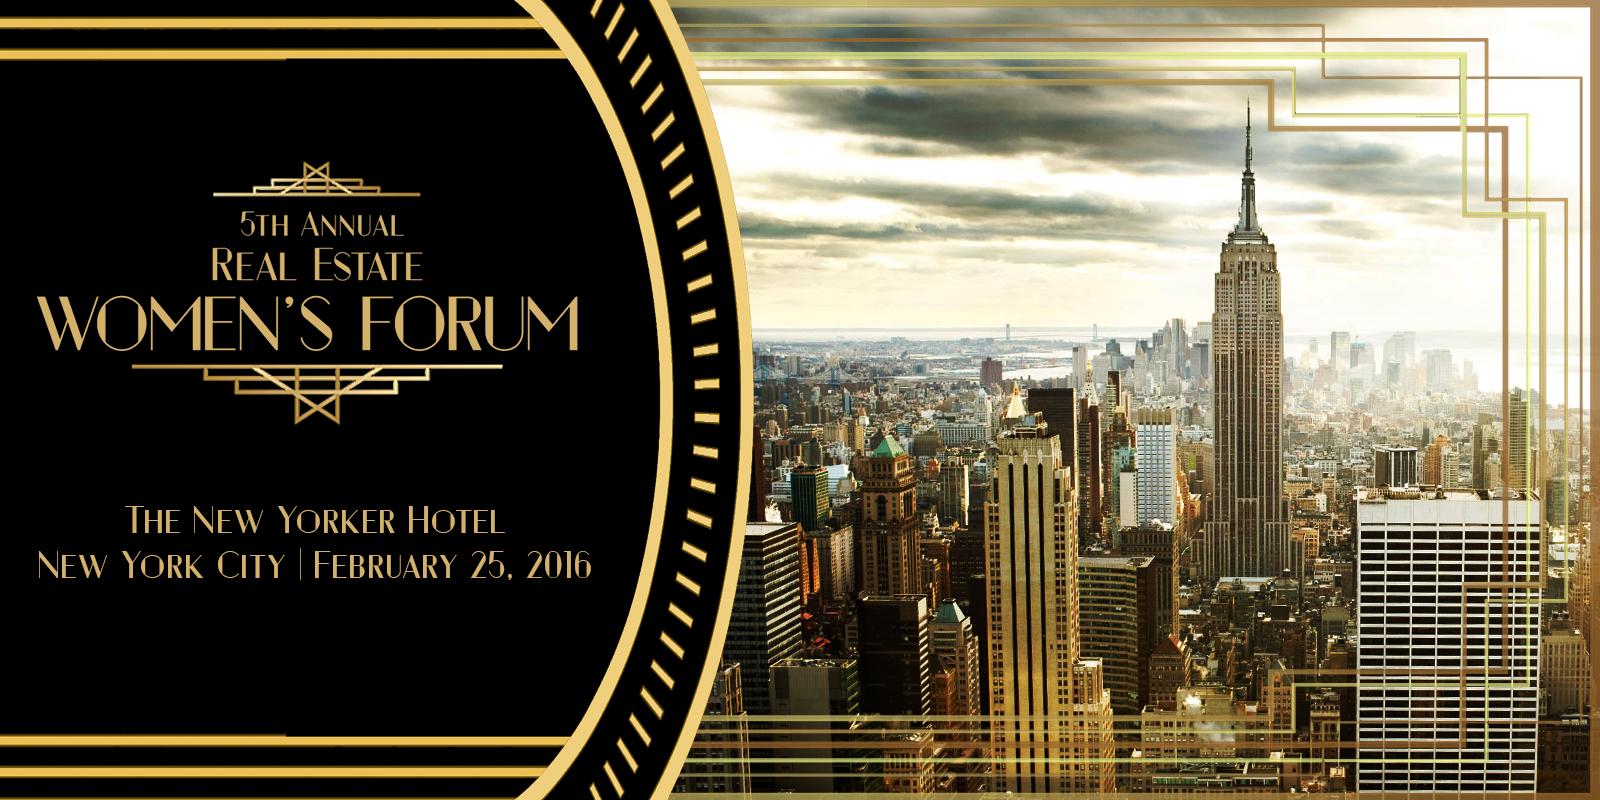 5th Annual Real Estate Women's Forum